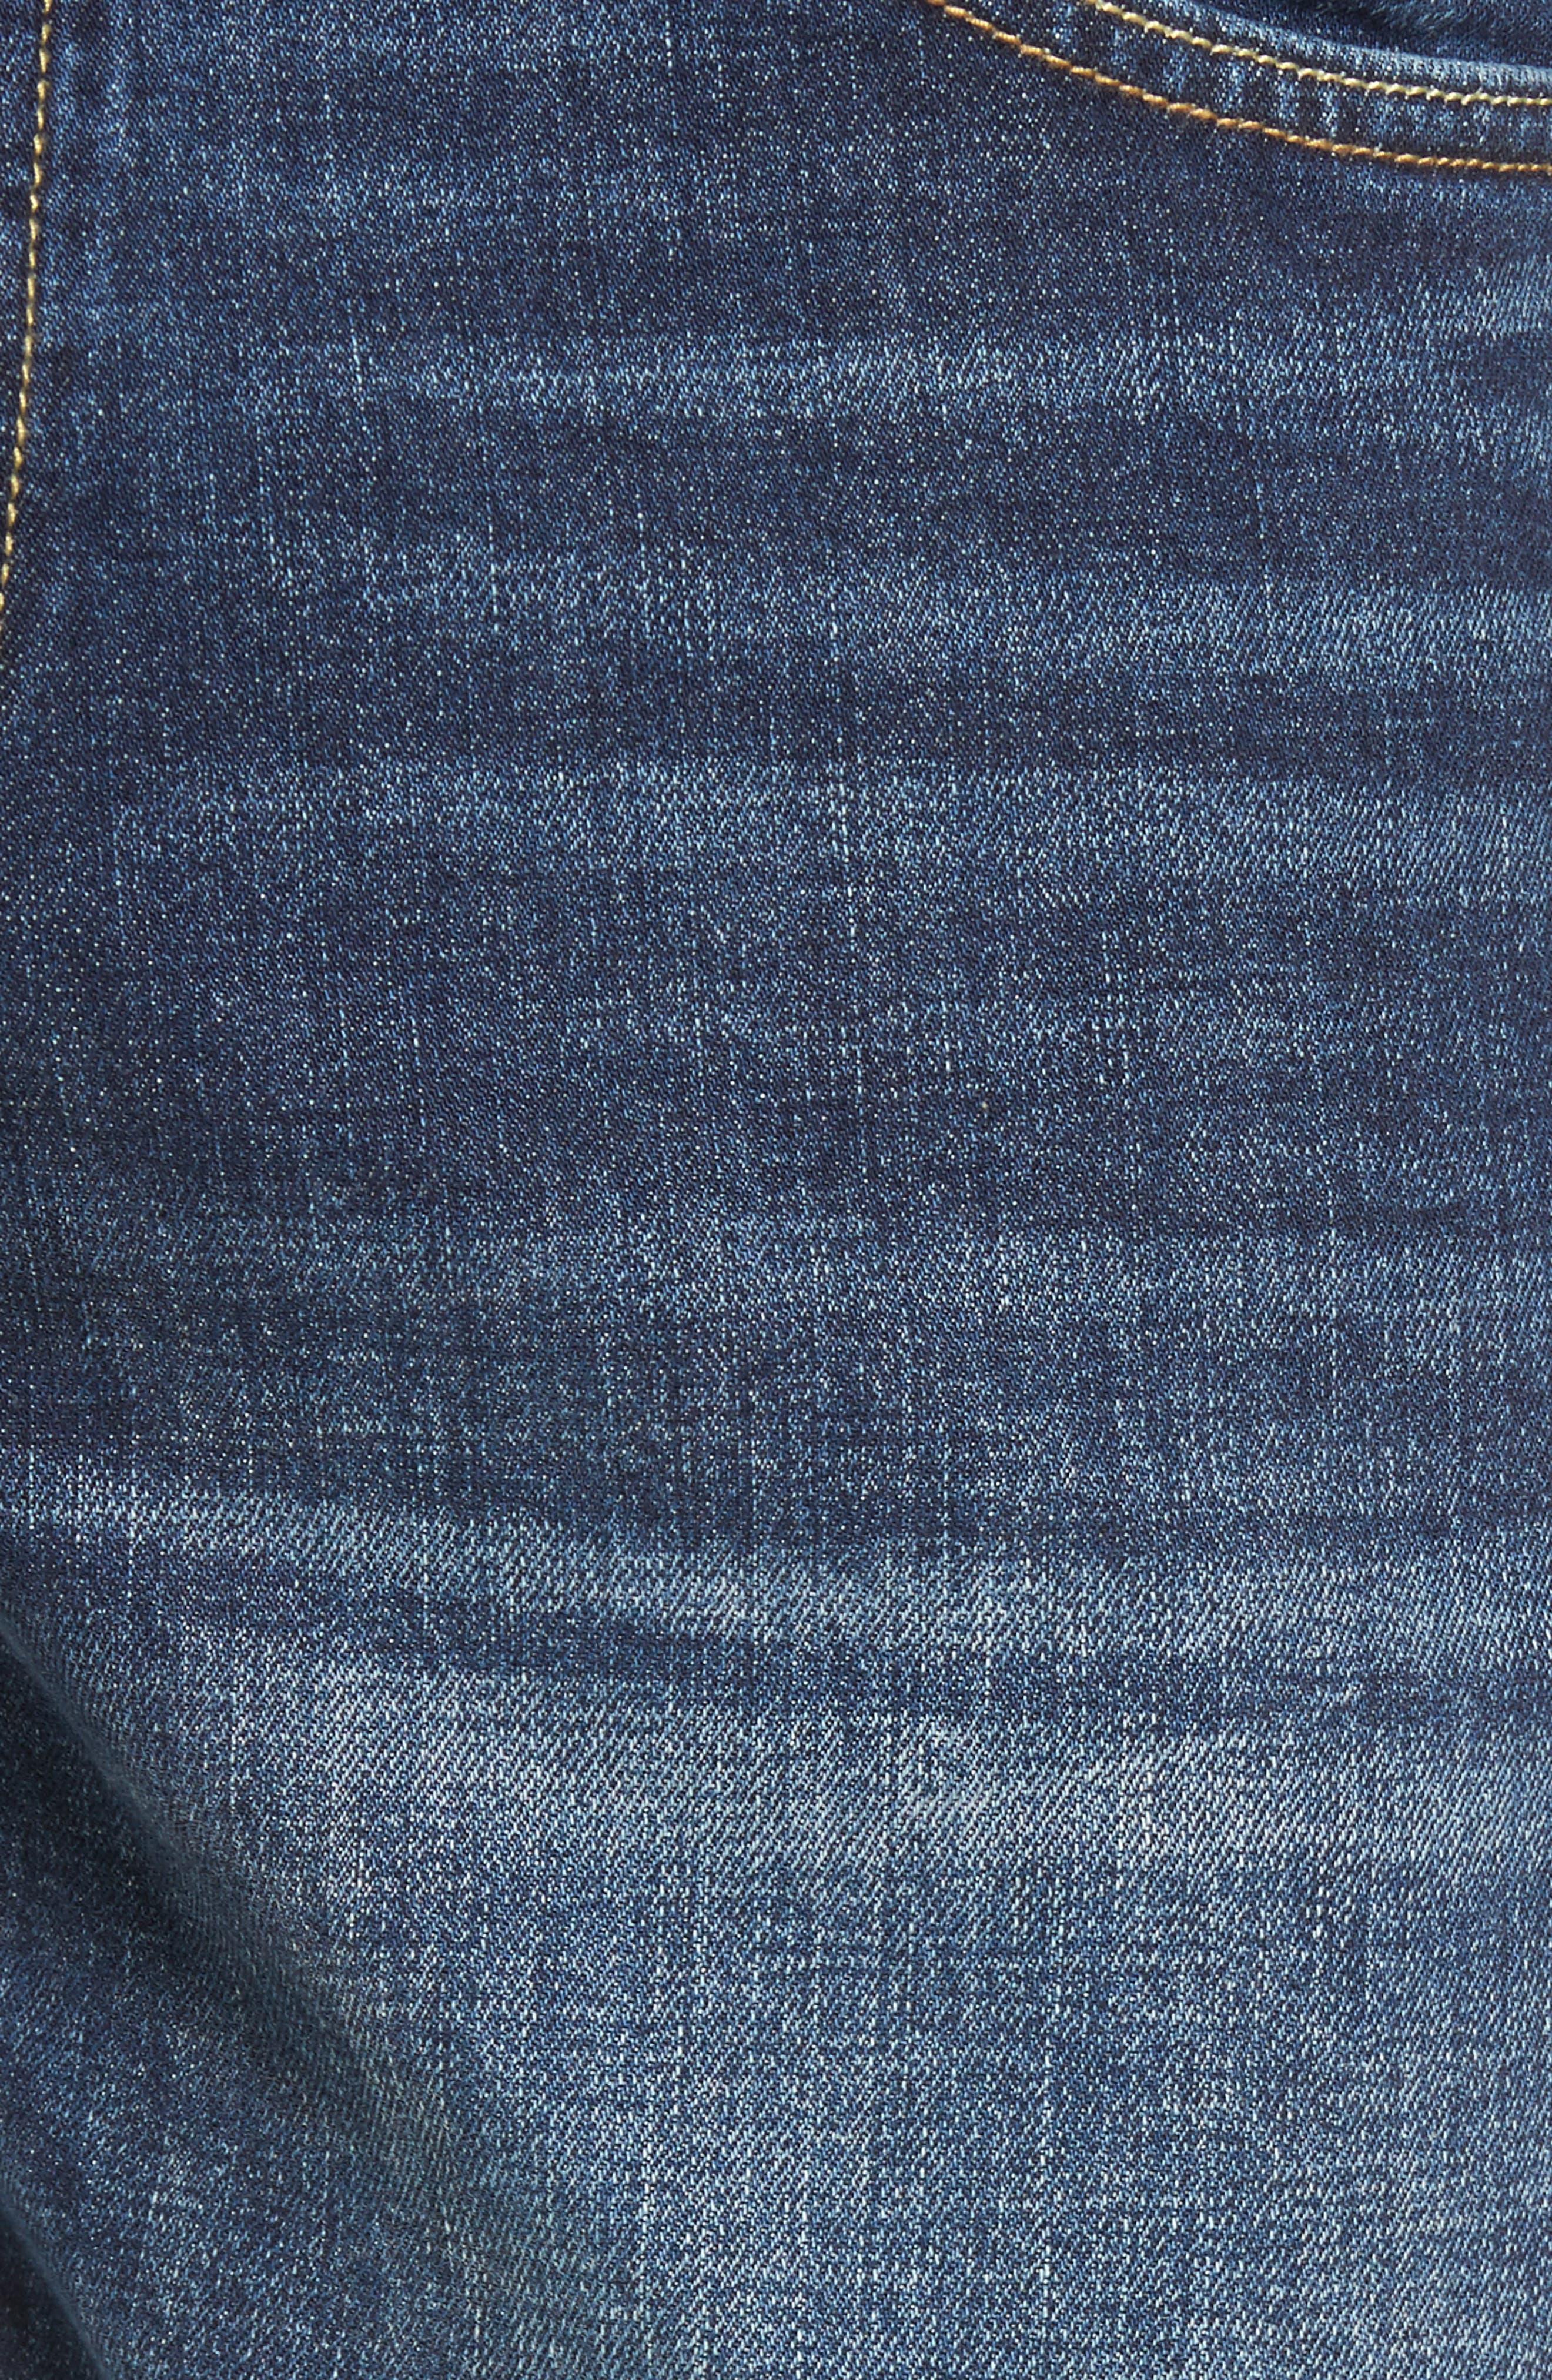 Slim Straight Leg Jeans,                             Alternate thumbnail 5, color,                             Medium Wash